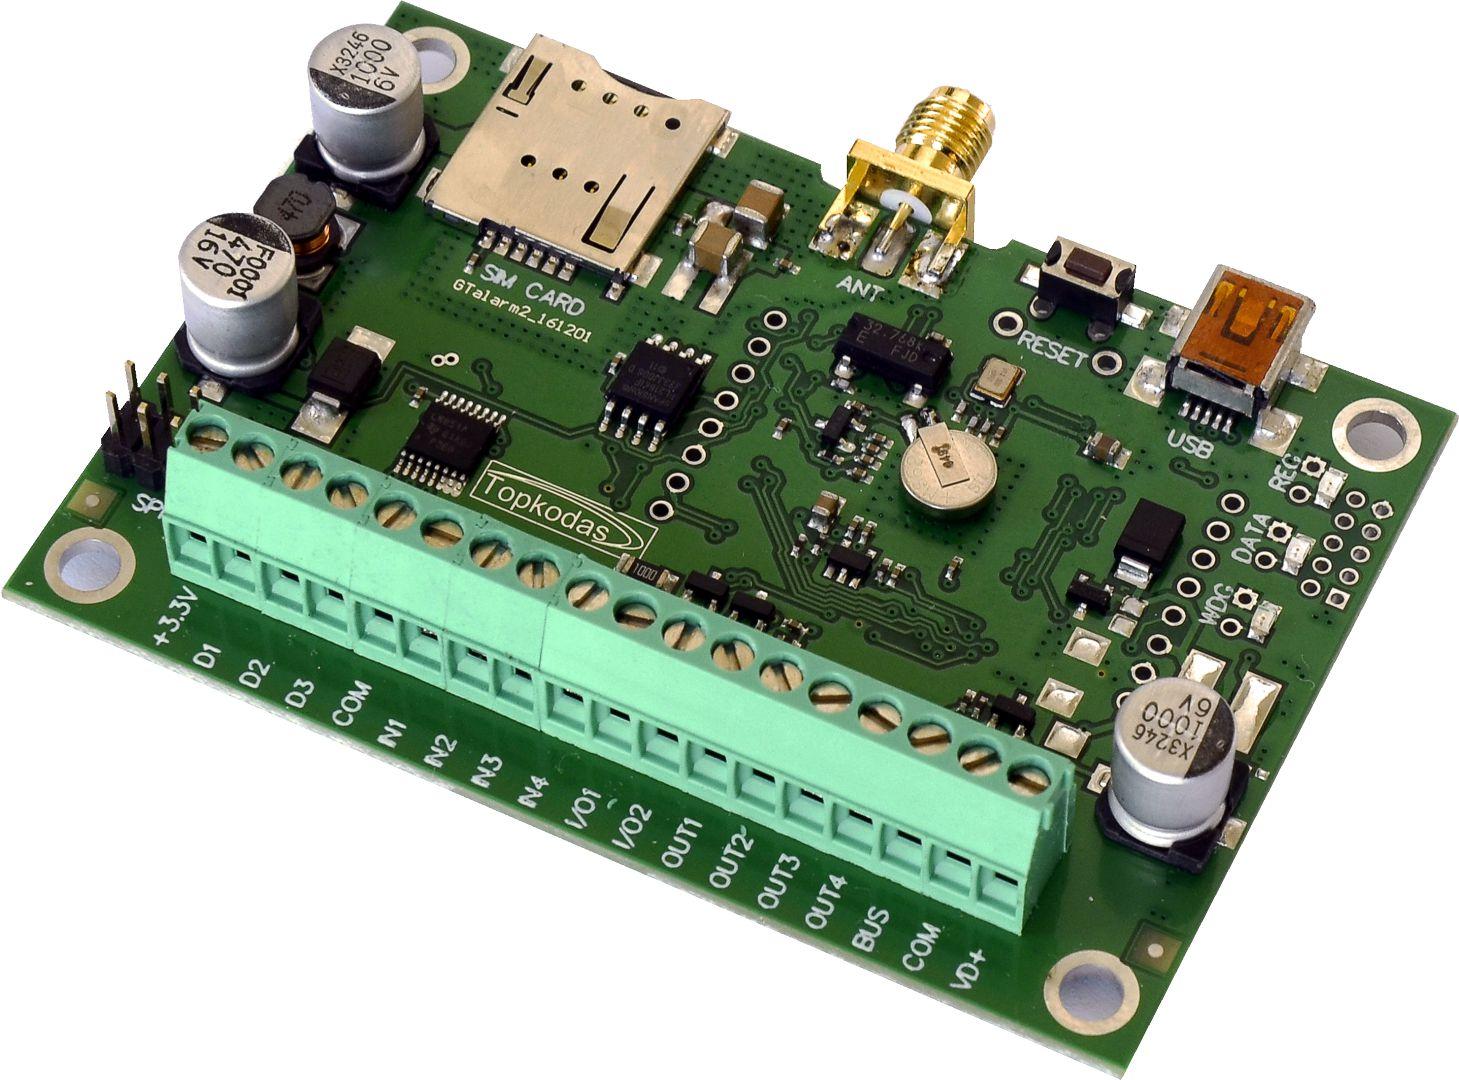 Sensor alarm, monitoring and control system